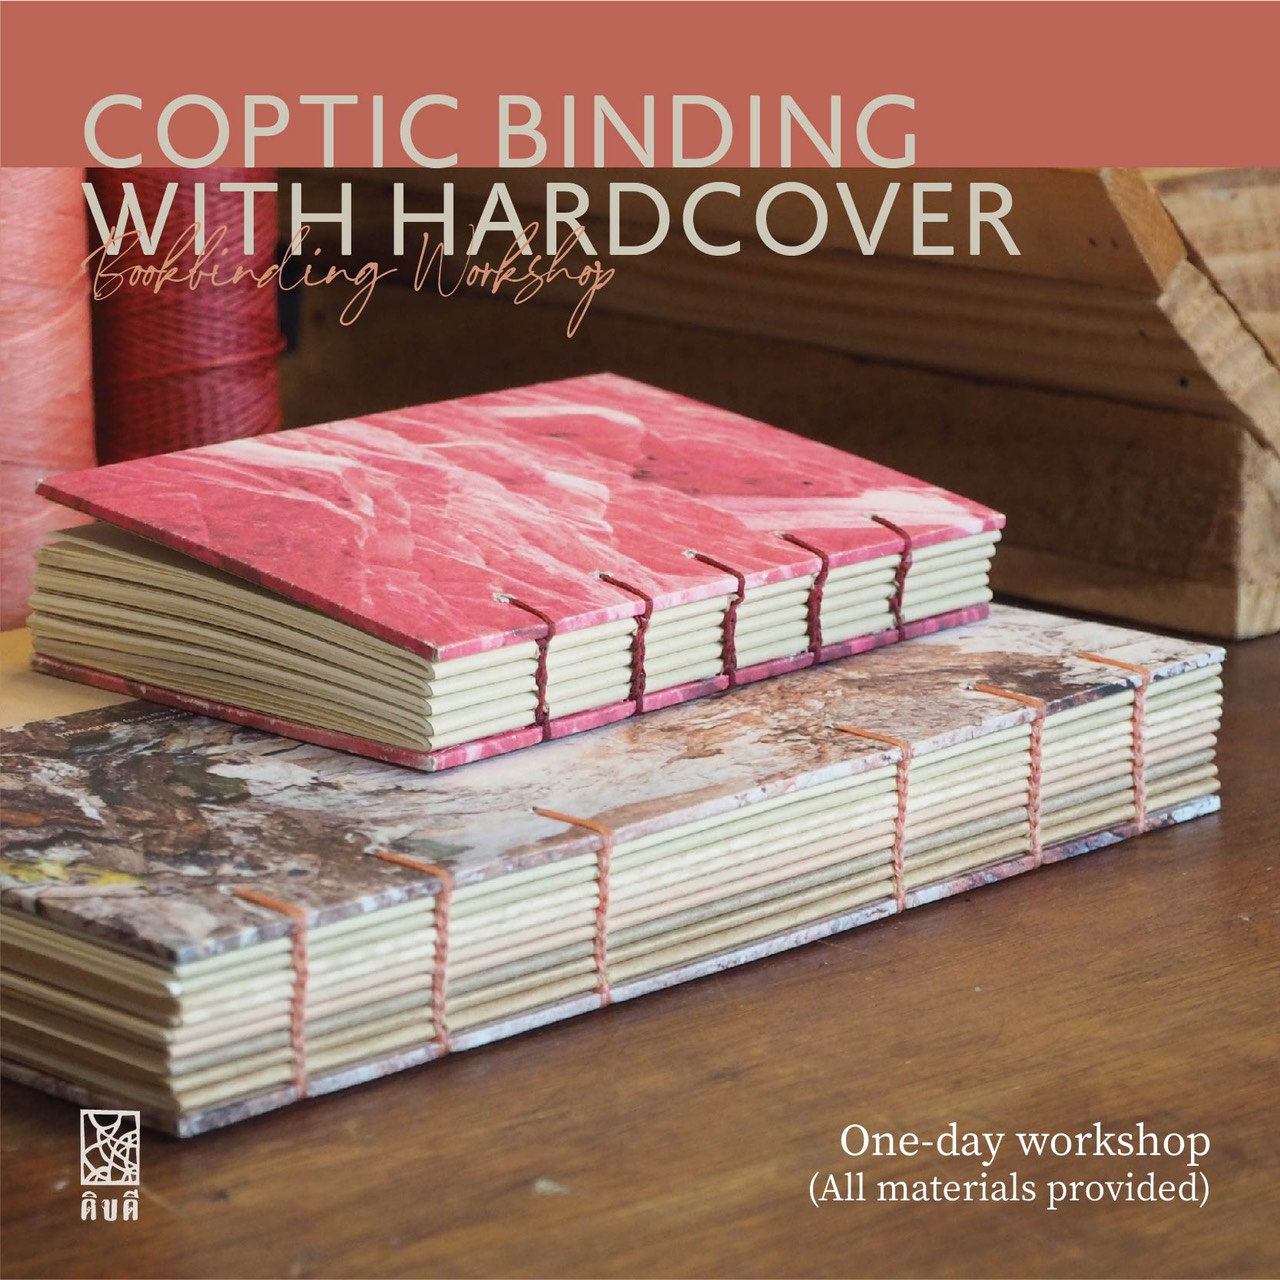 Coptic Binding with Hardcover